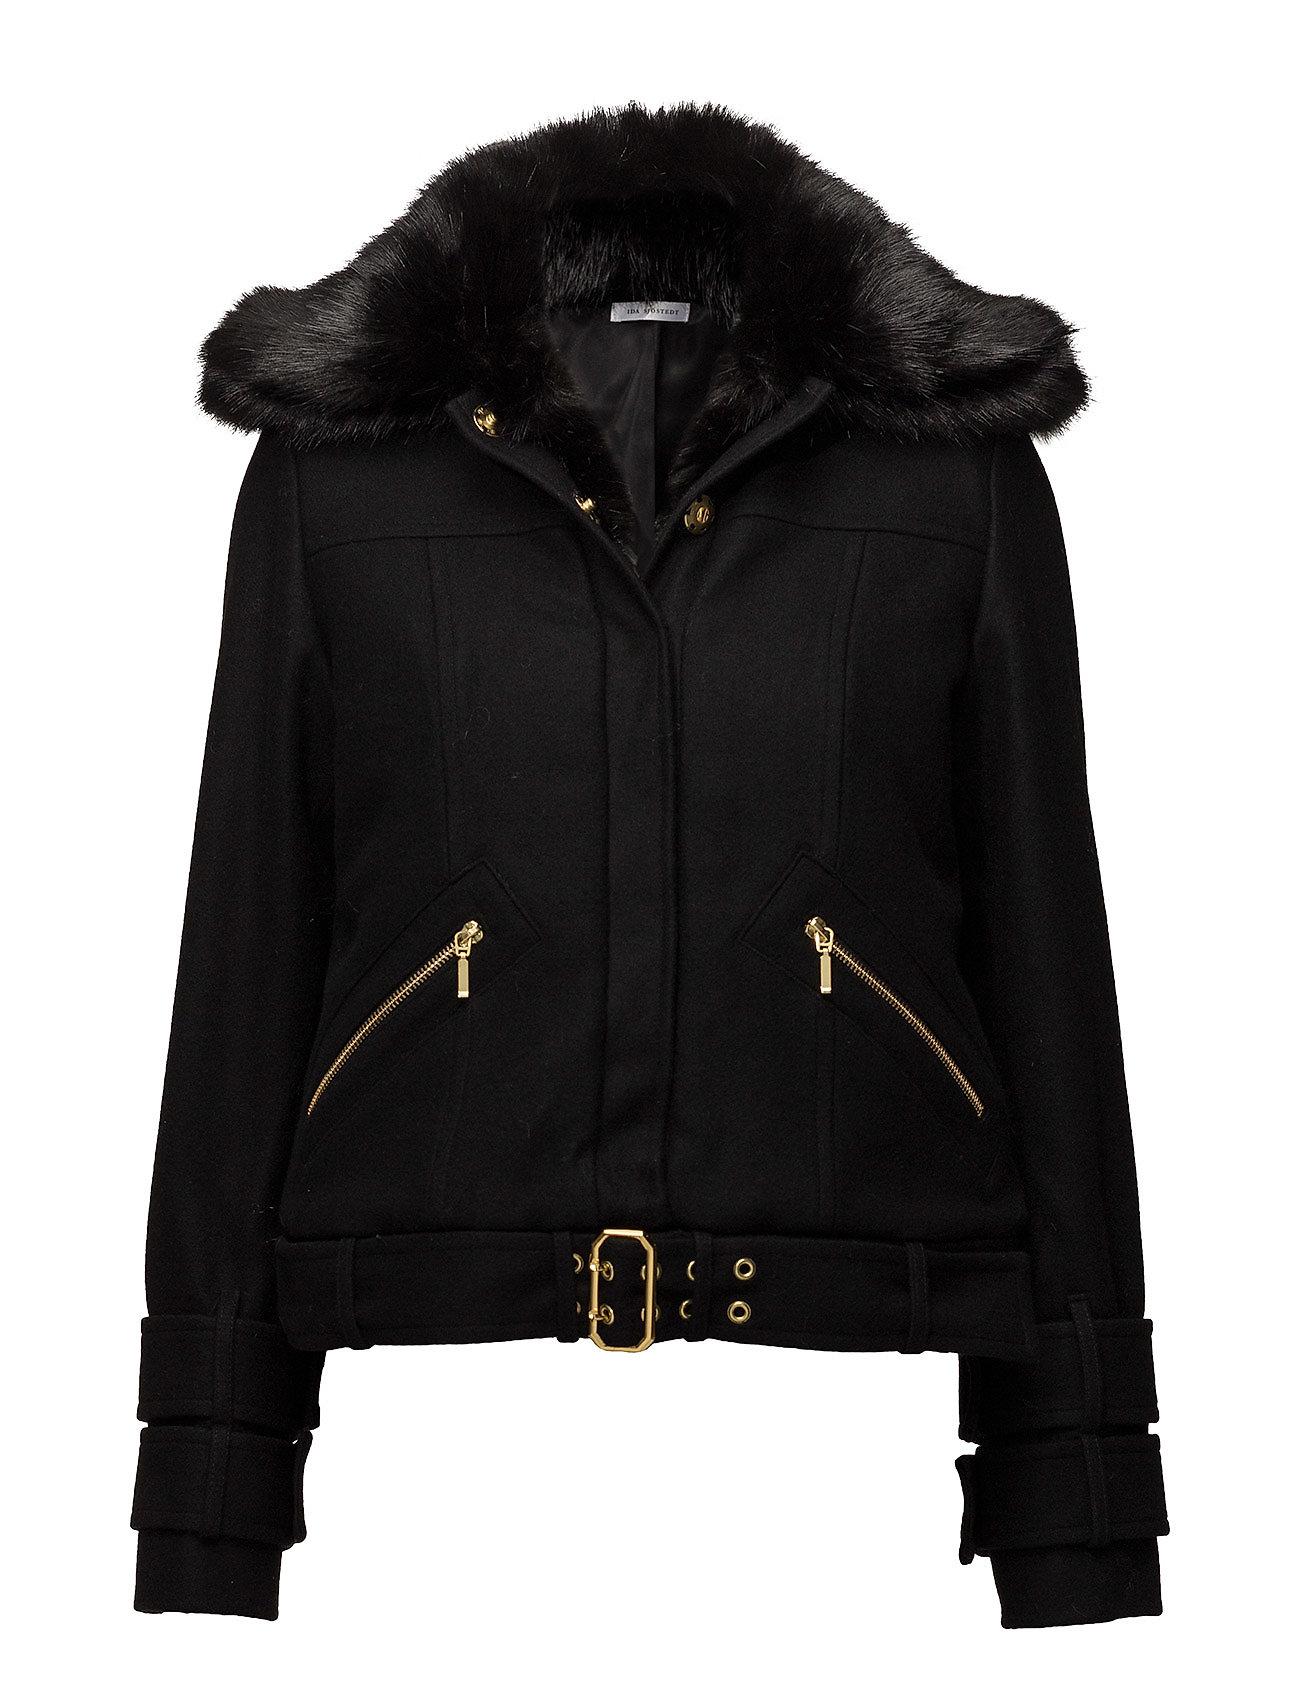 ida sjã¶stedt – Coco jacket på boozt.com dk